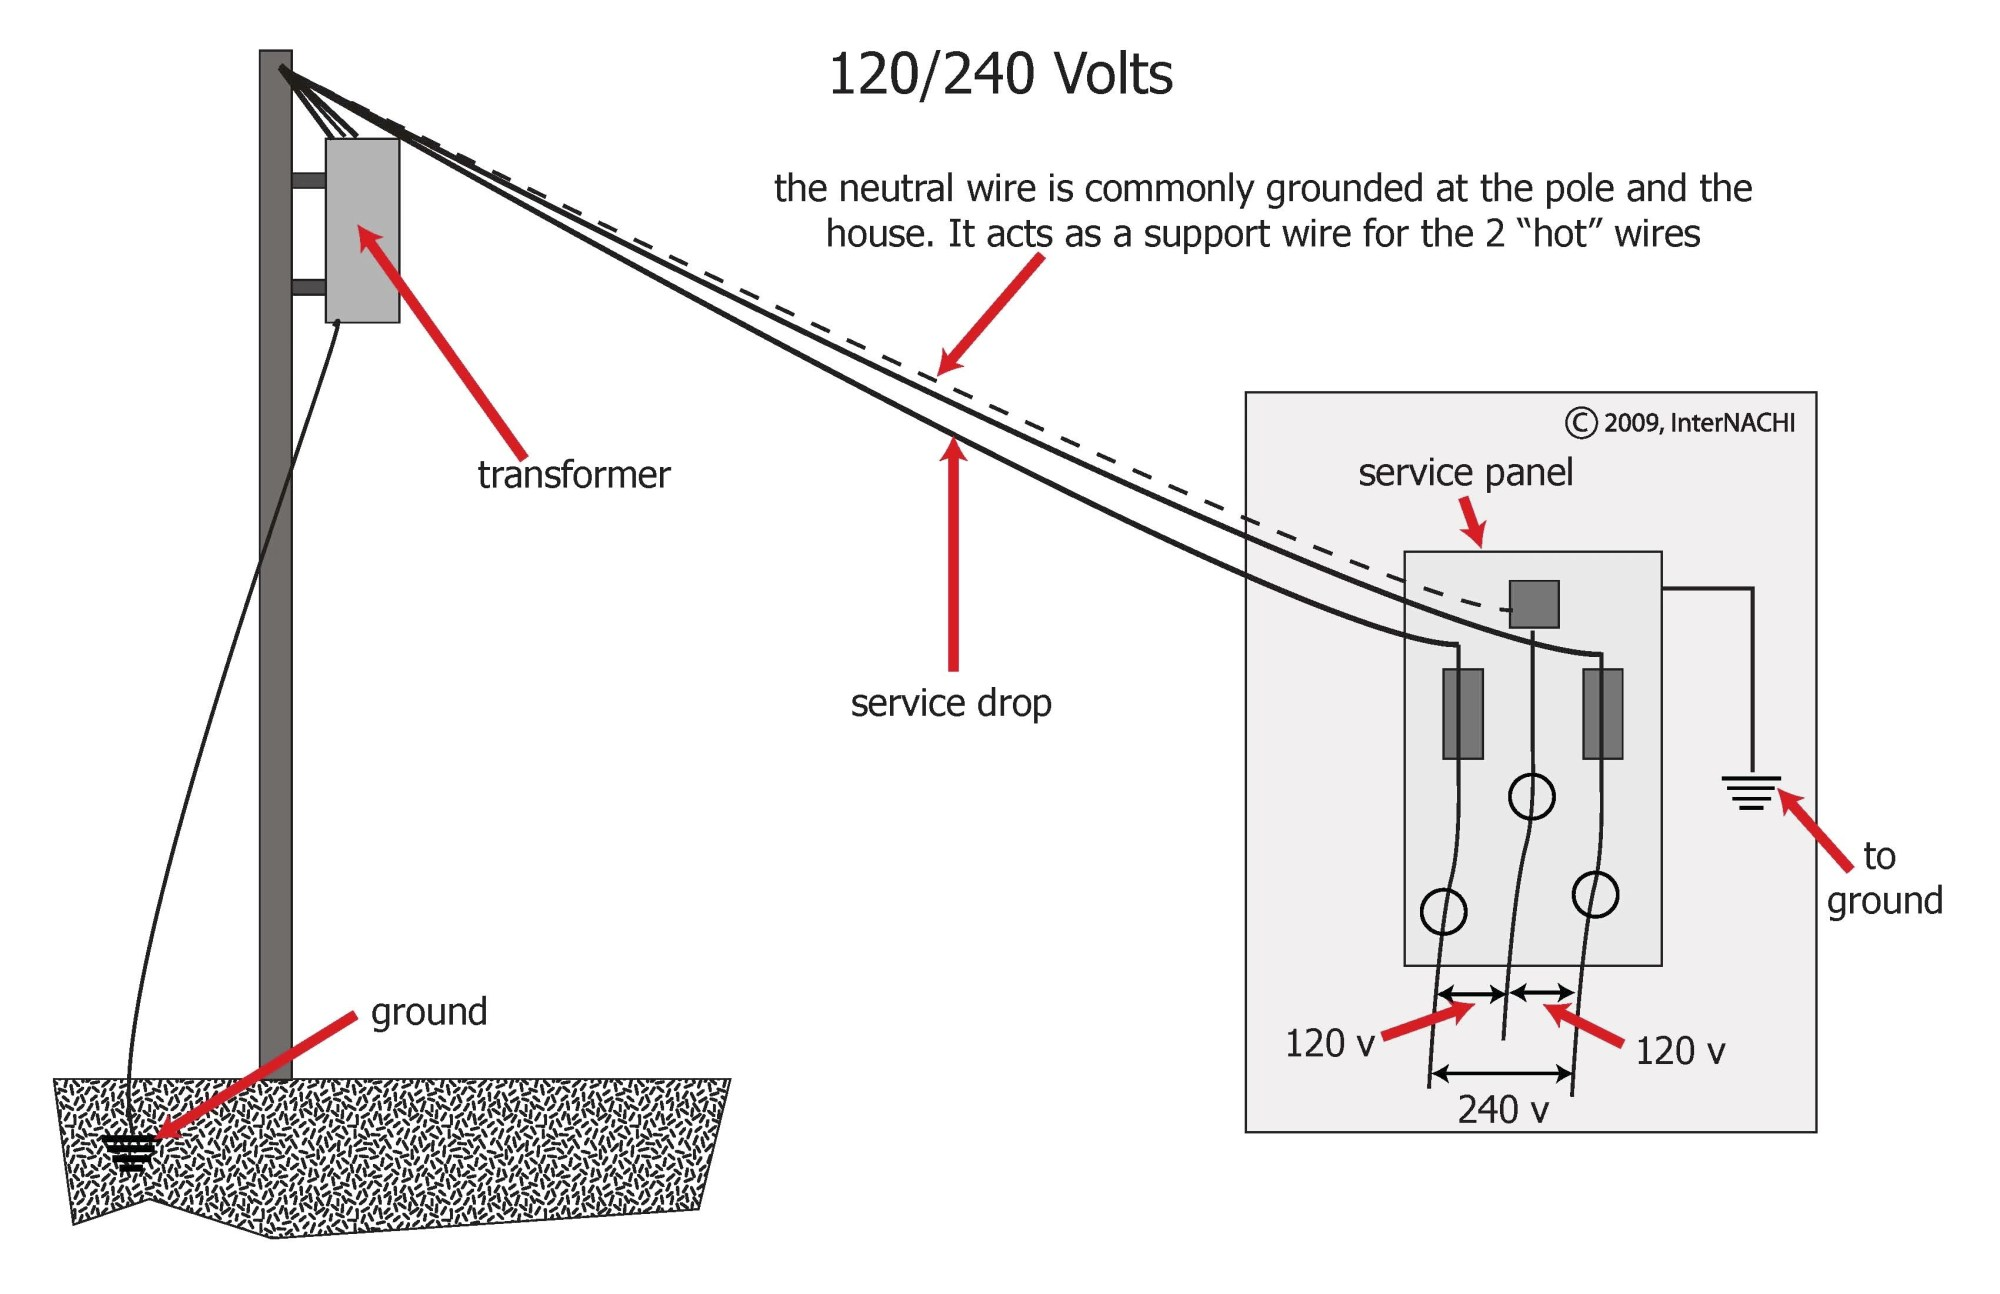 hight resolution of service drop diagram data wiring diagramservice drop diagram wiring diagram data val service drop diagram